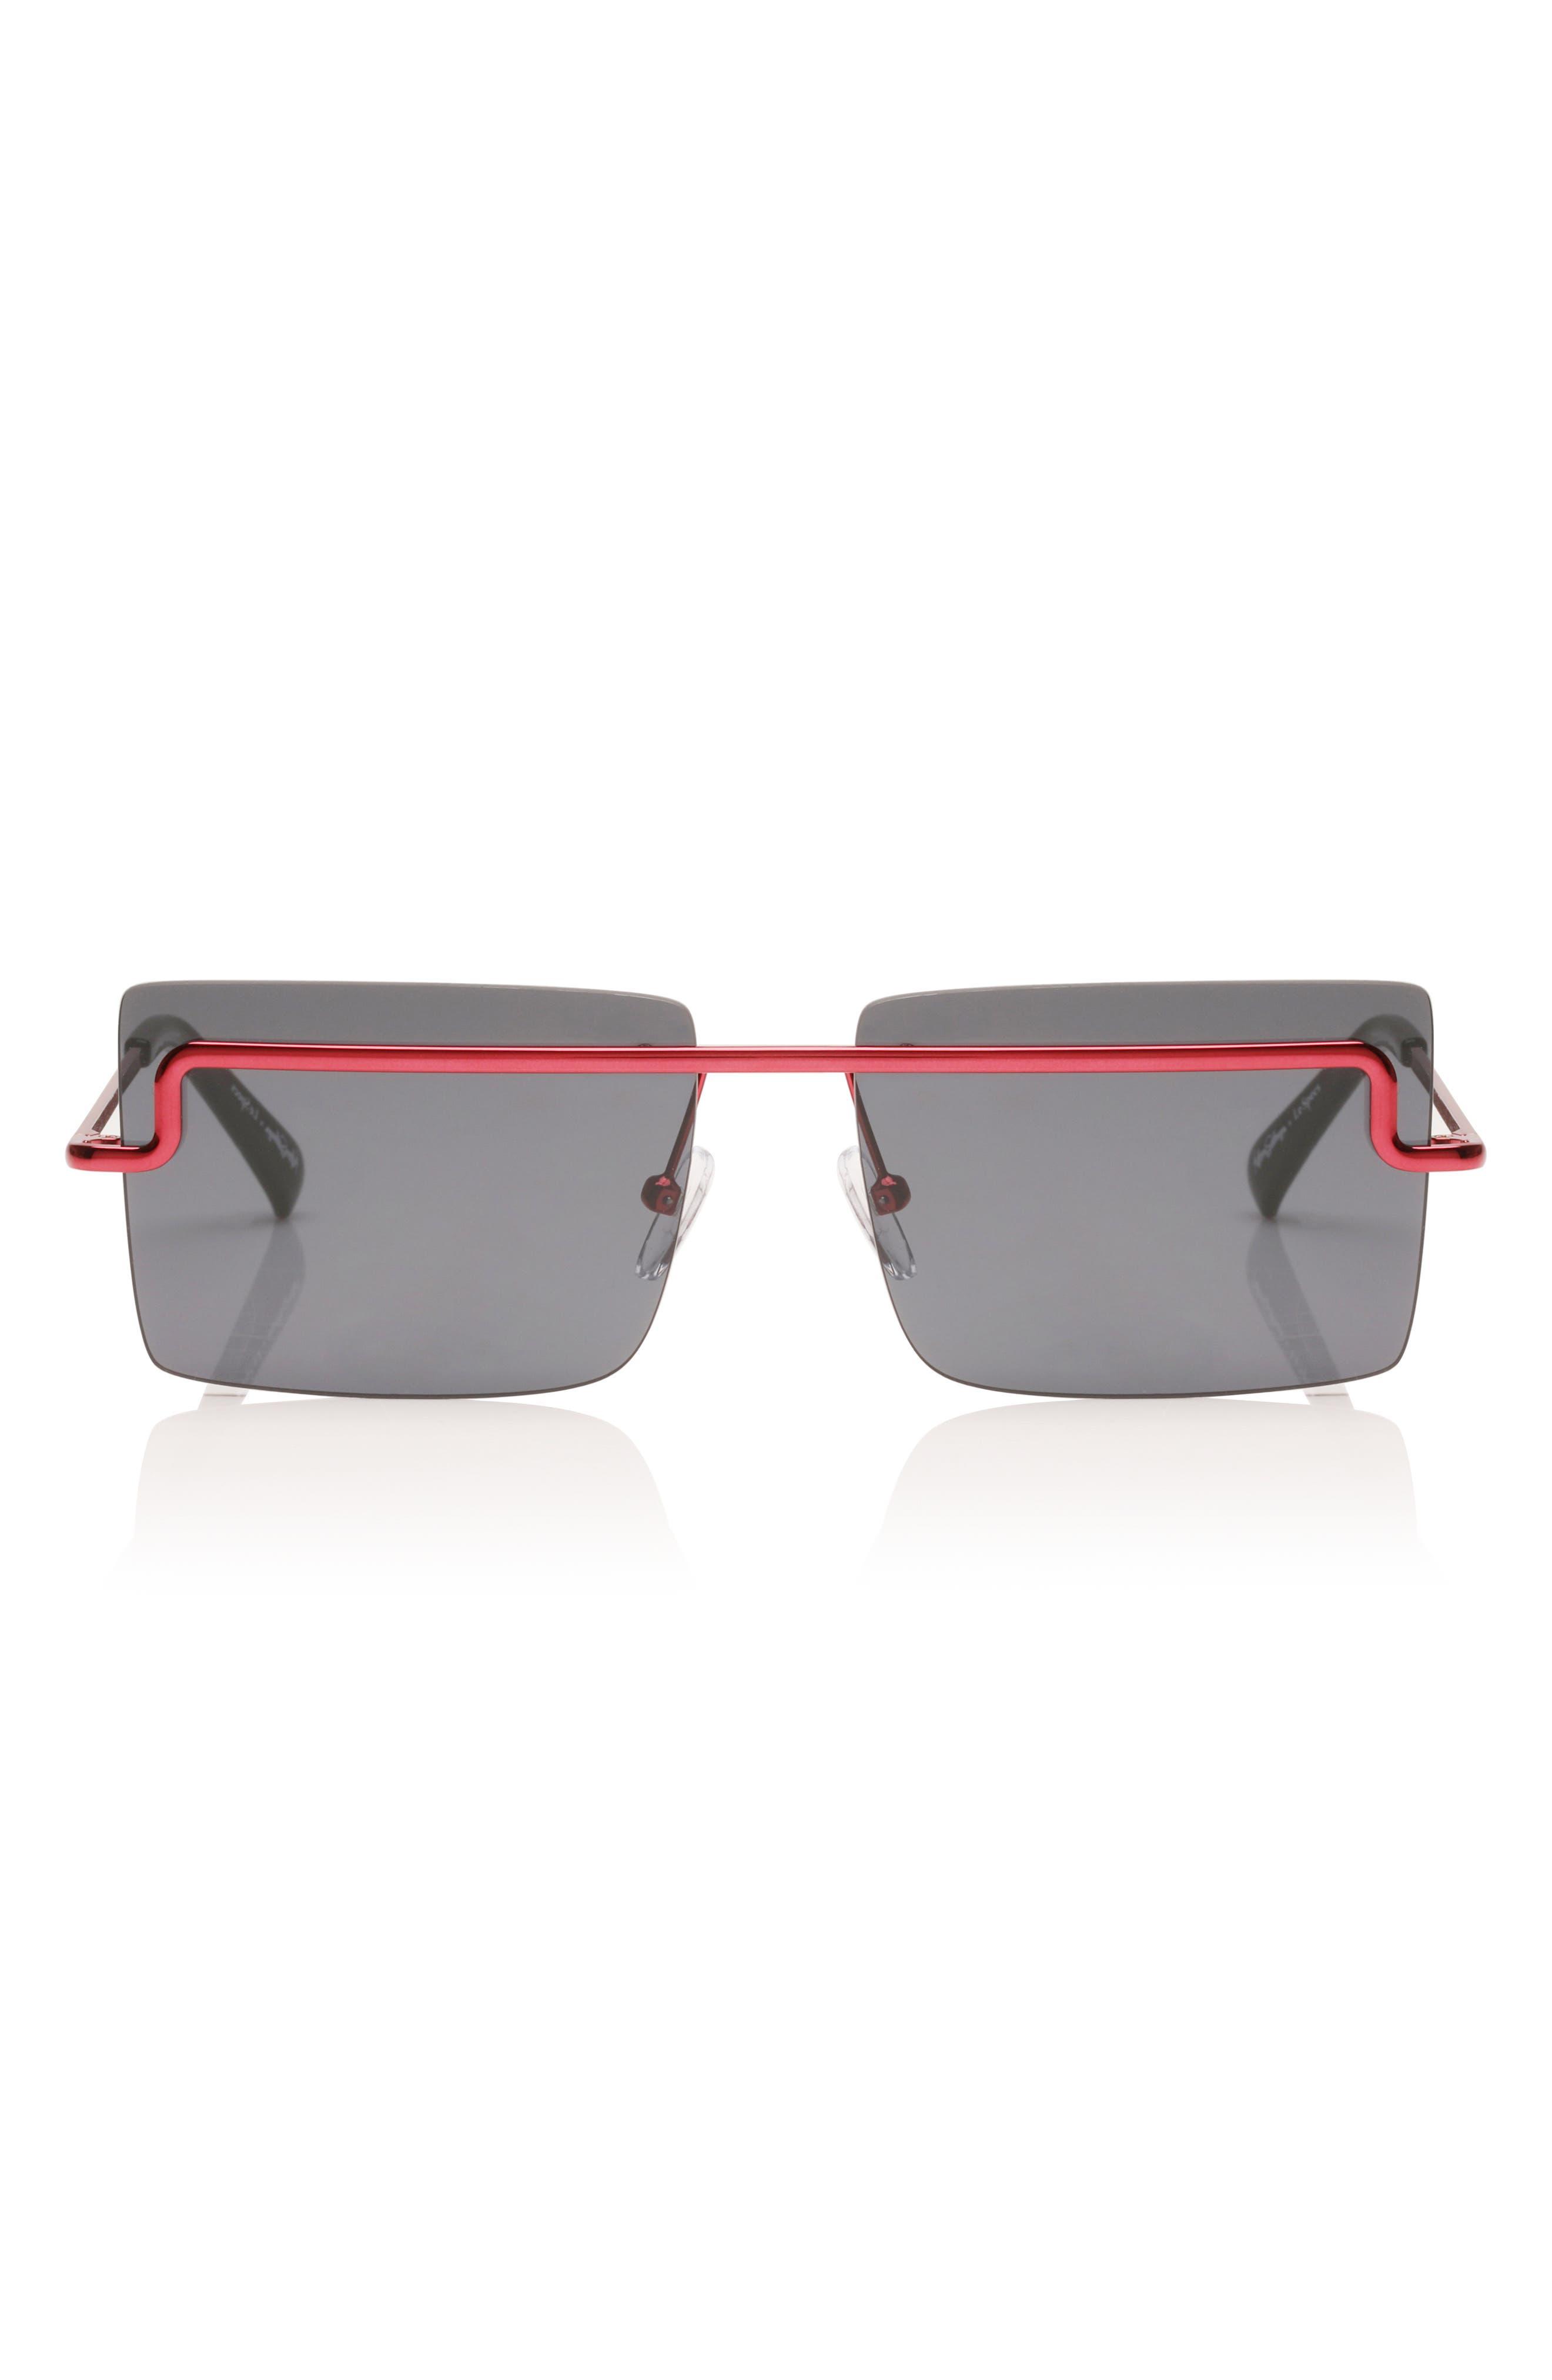 Adam Selman X Le Specs Luxe The International 5m Sunglasses - Metallic Red/ Navy Mono